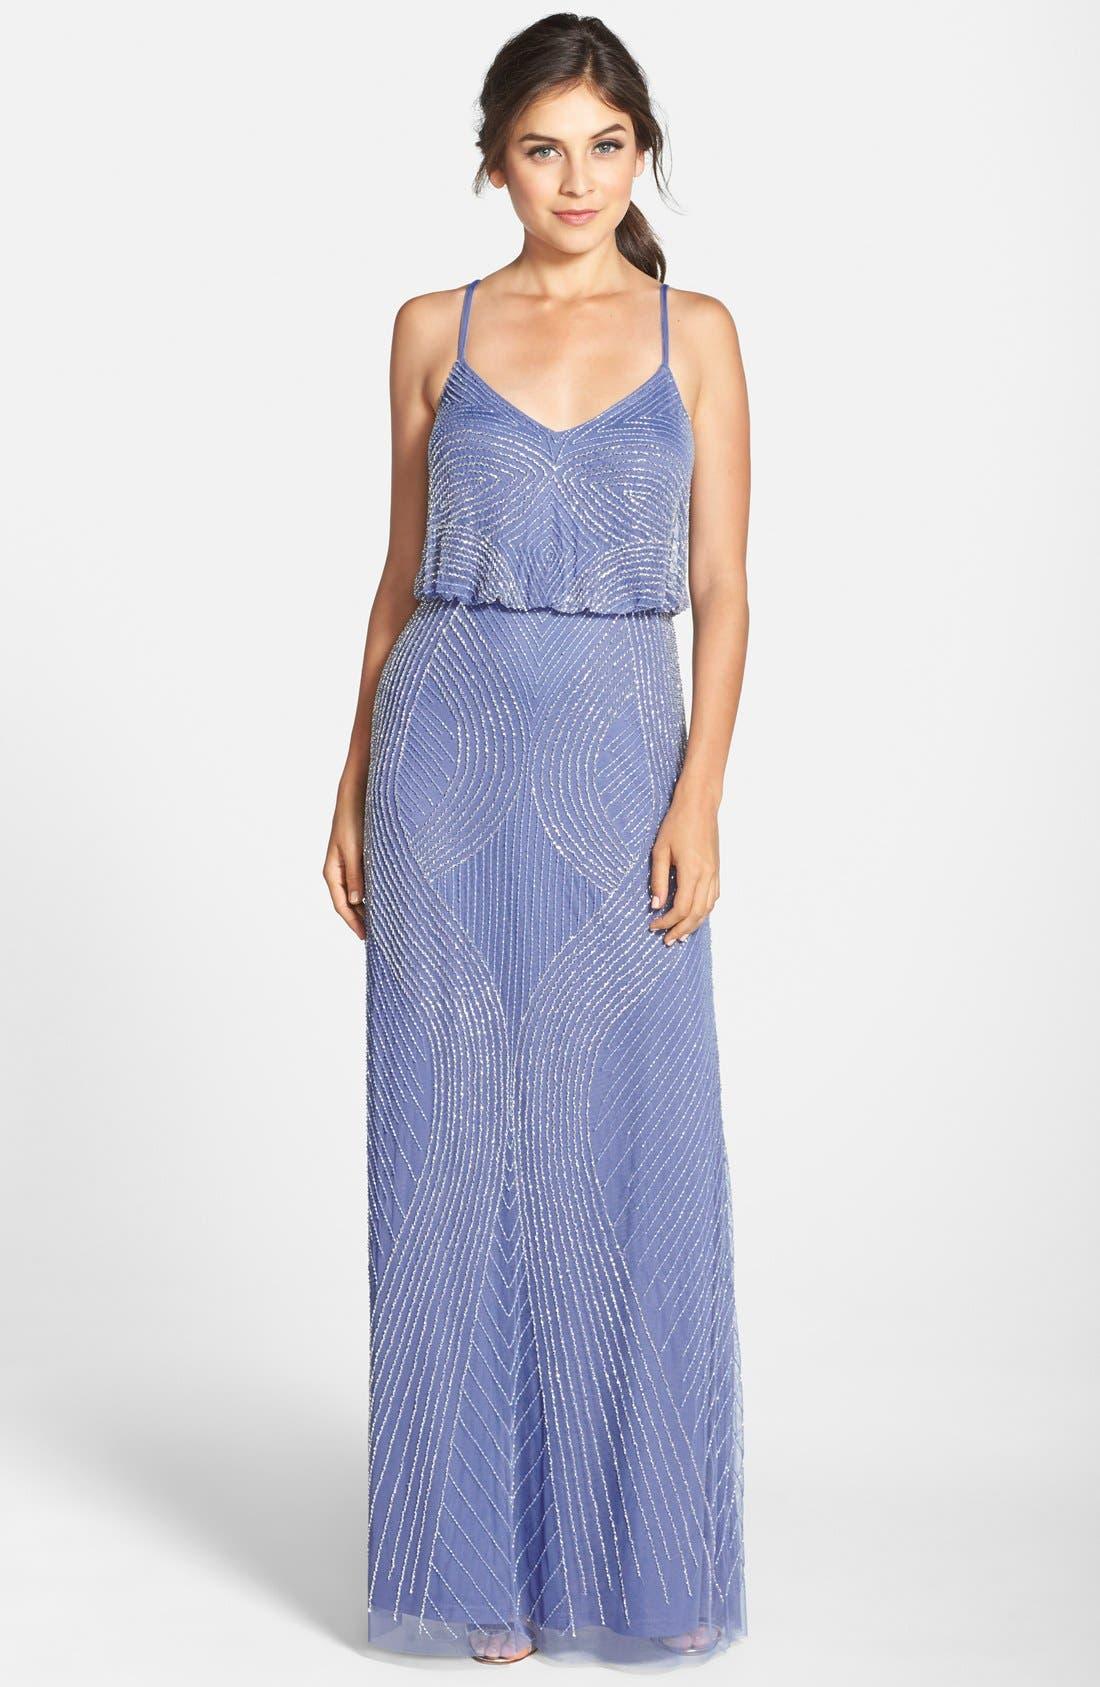 Alternate Image 1 Selected - Adrianna Papell Beaded Blouson Maxi Dress